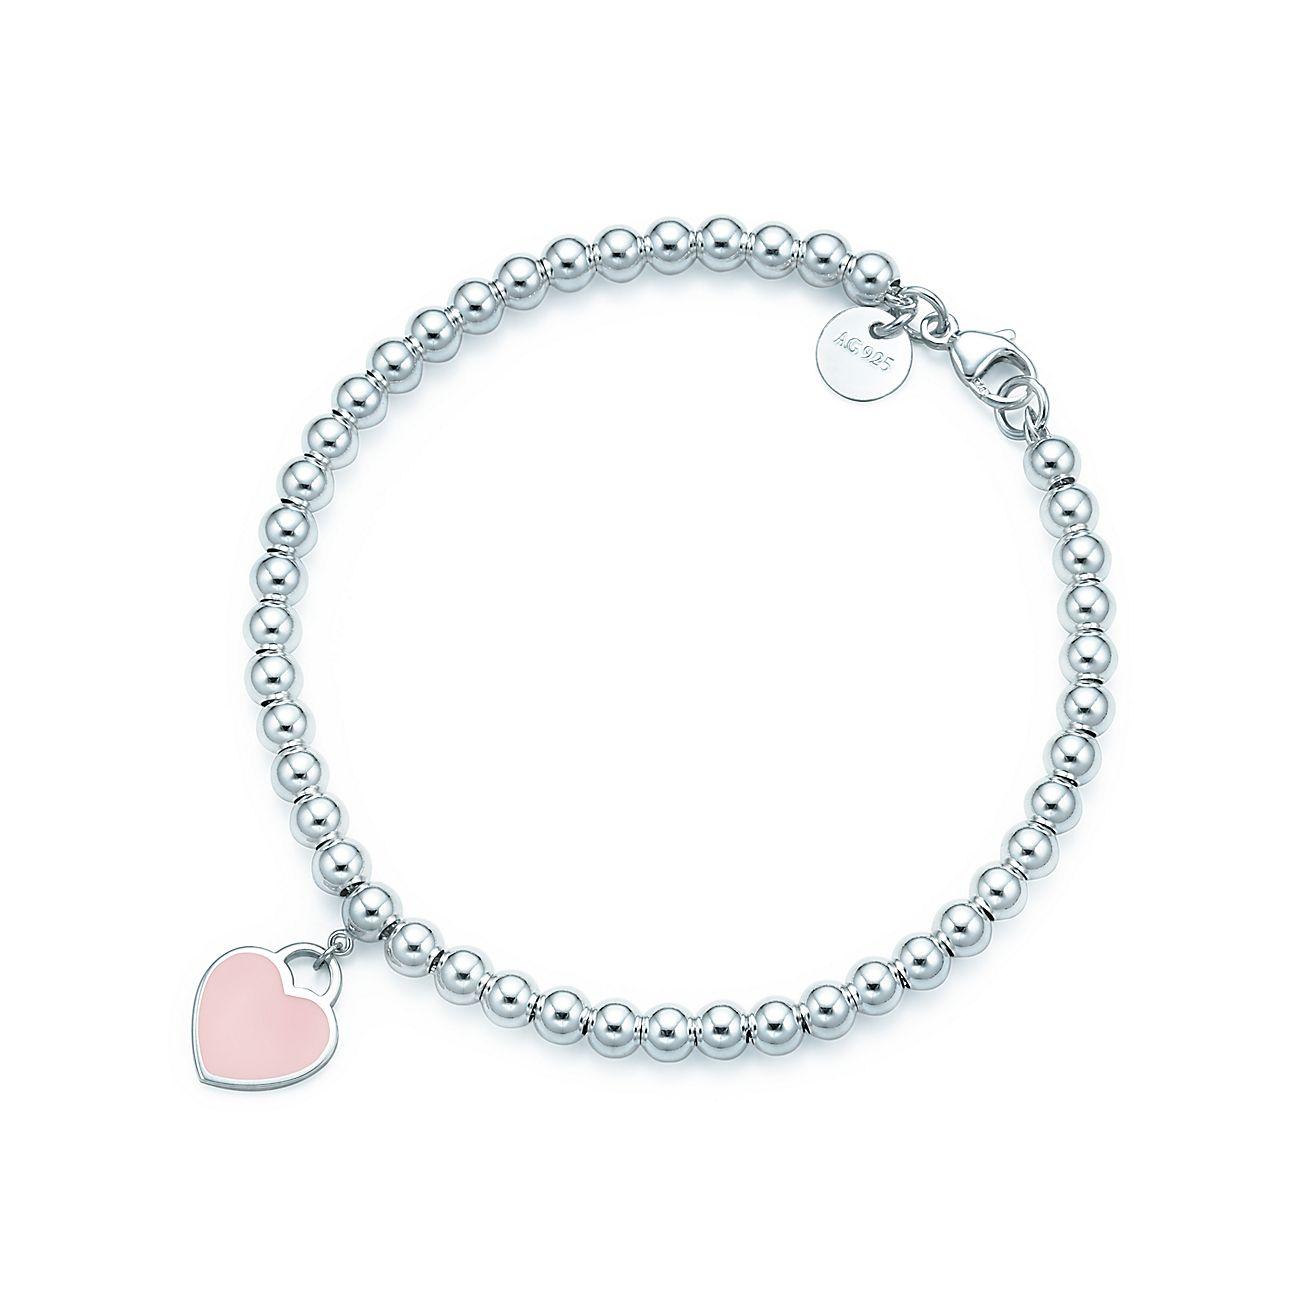 Return To Tiffany Bead Bracelet In Silver With Pink Enamel Finish Medium Co